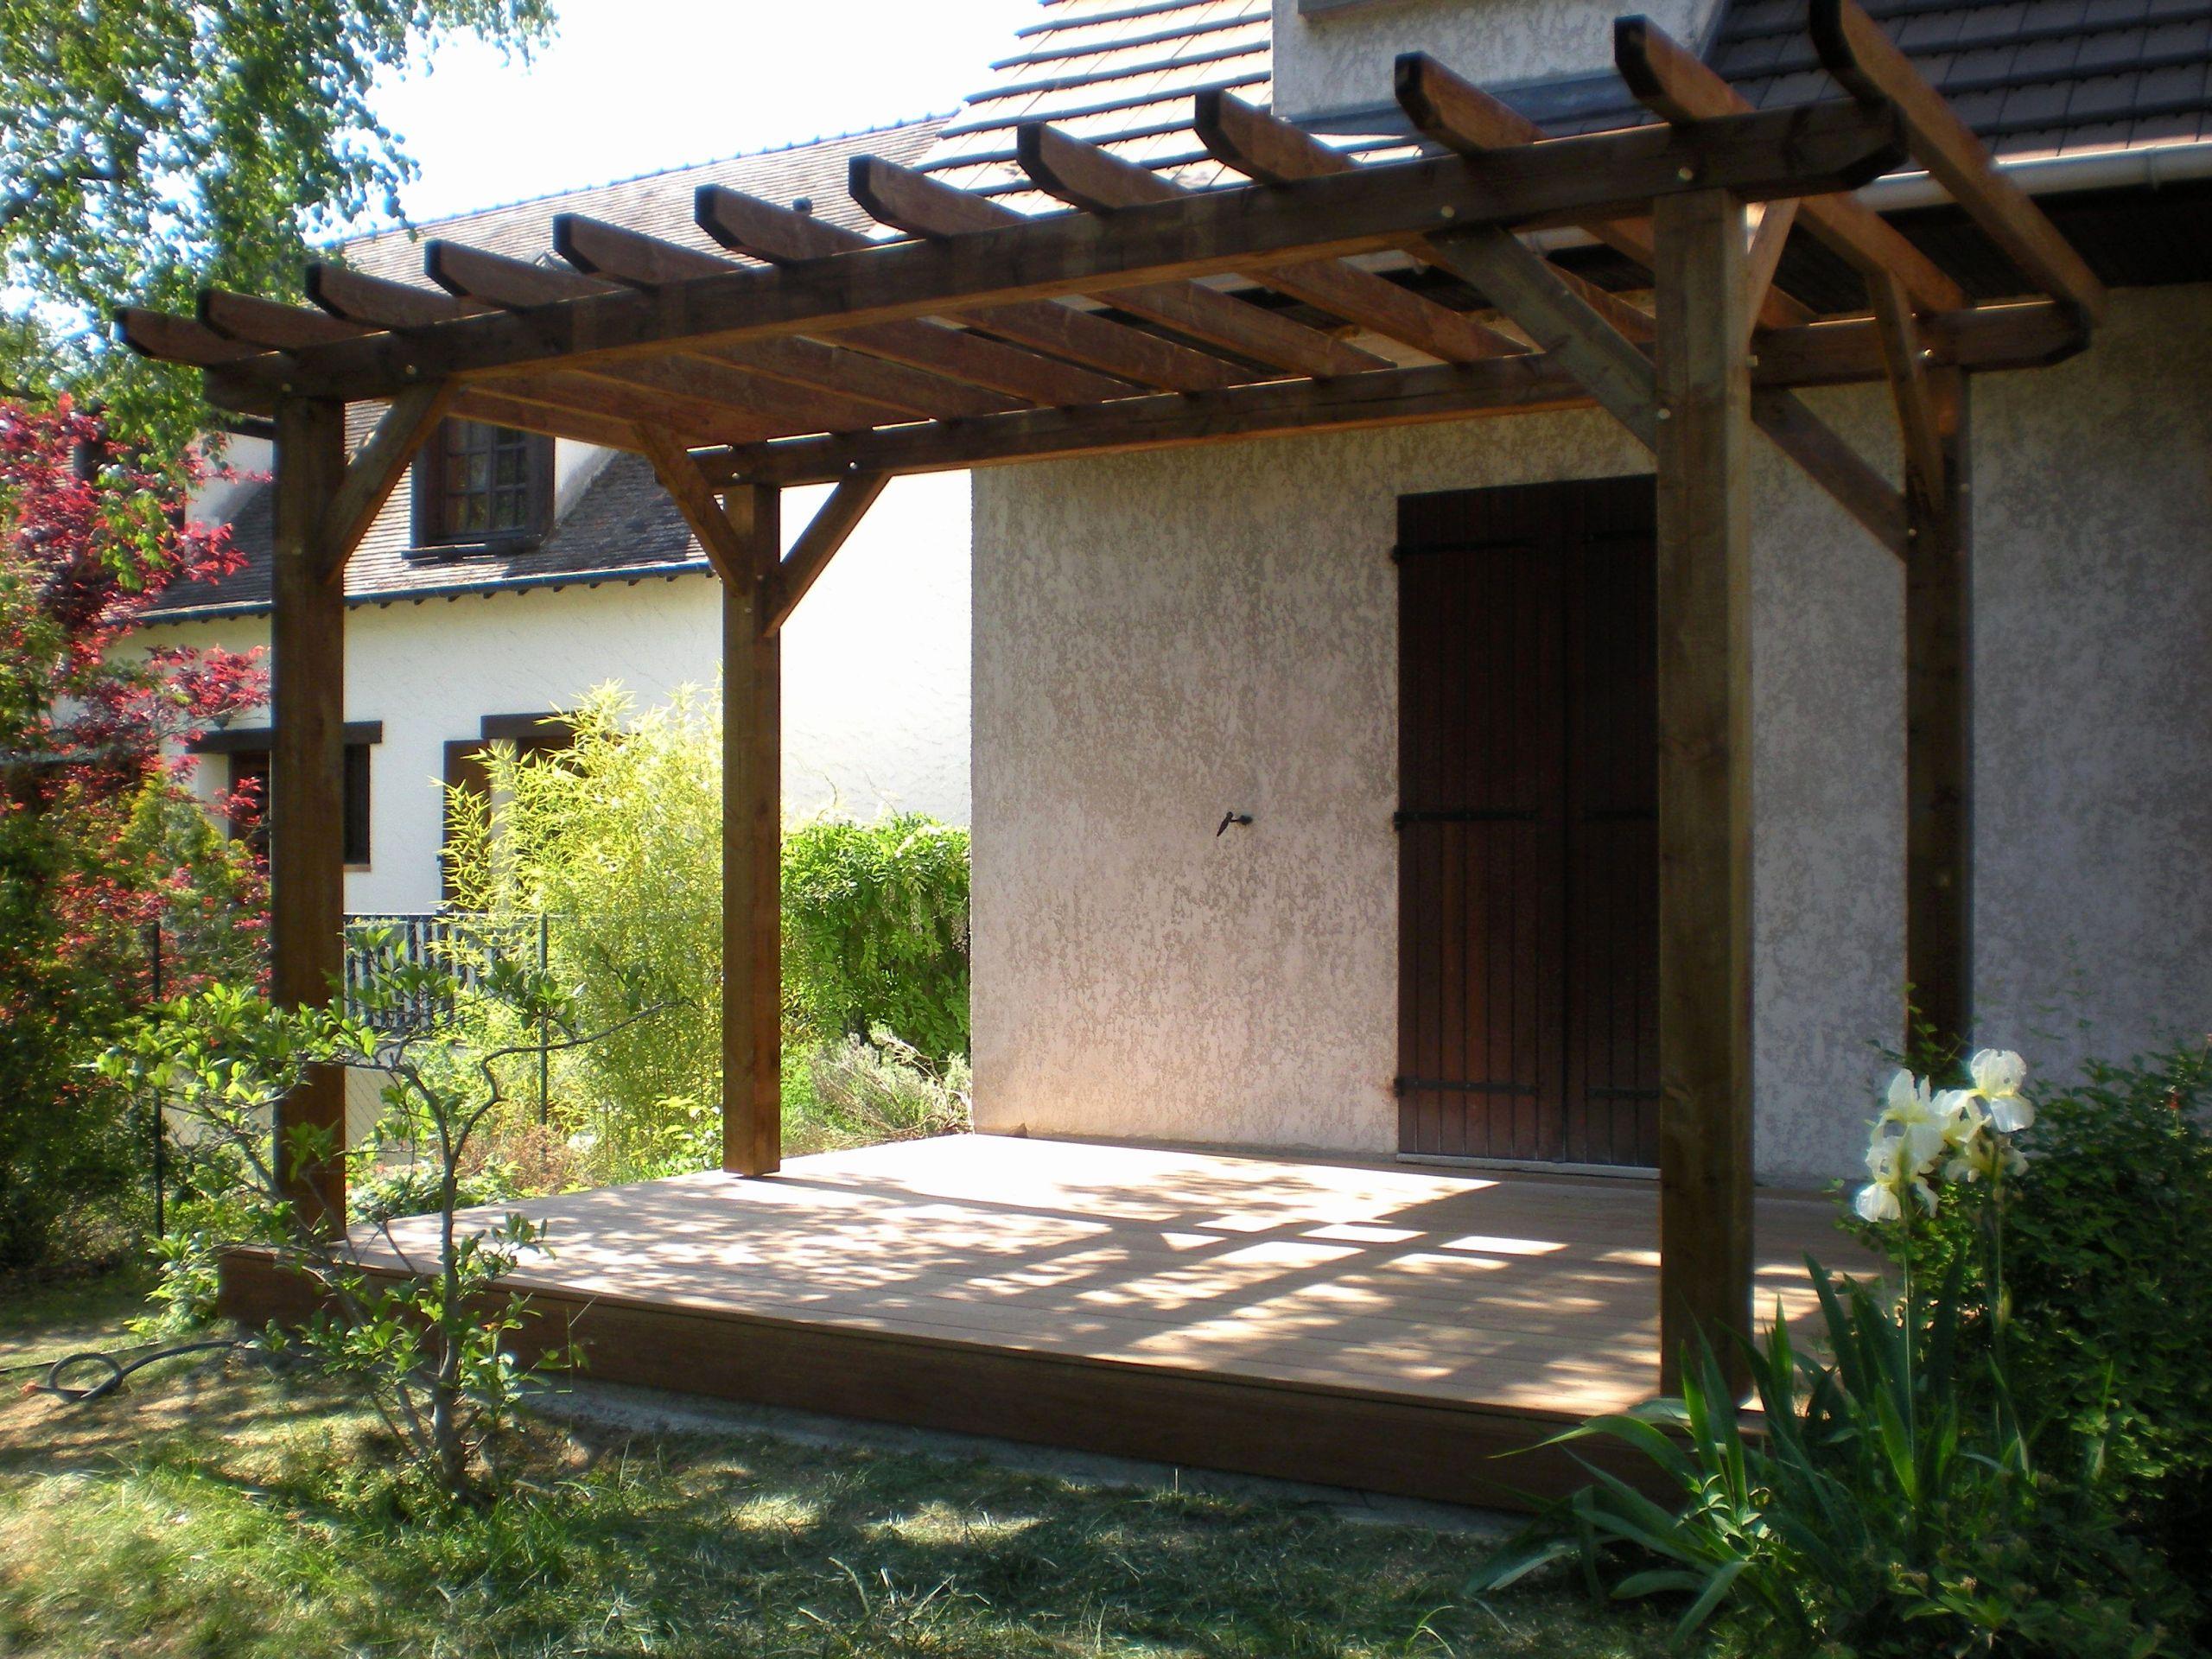 construire une pergola couverte elegant 28 elegant s de toile pour pergola bois of construire une pergola couverte